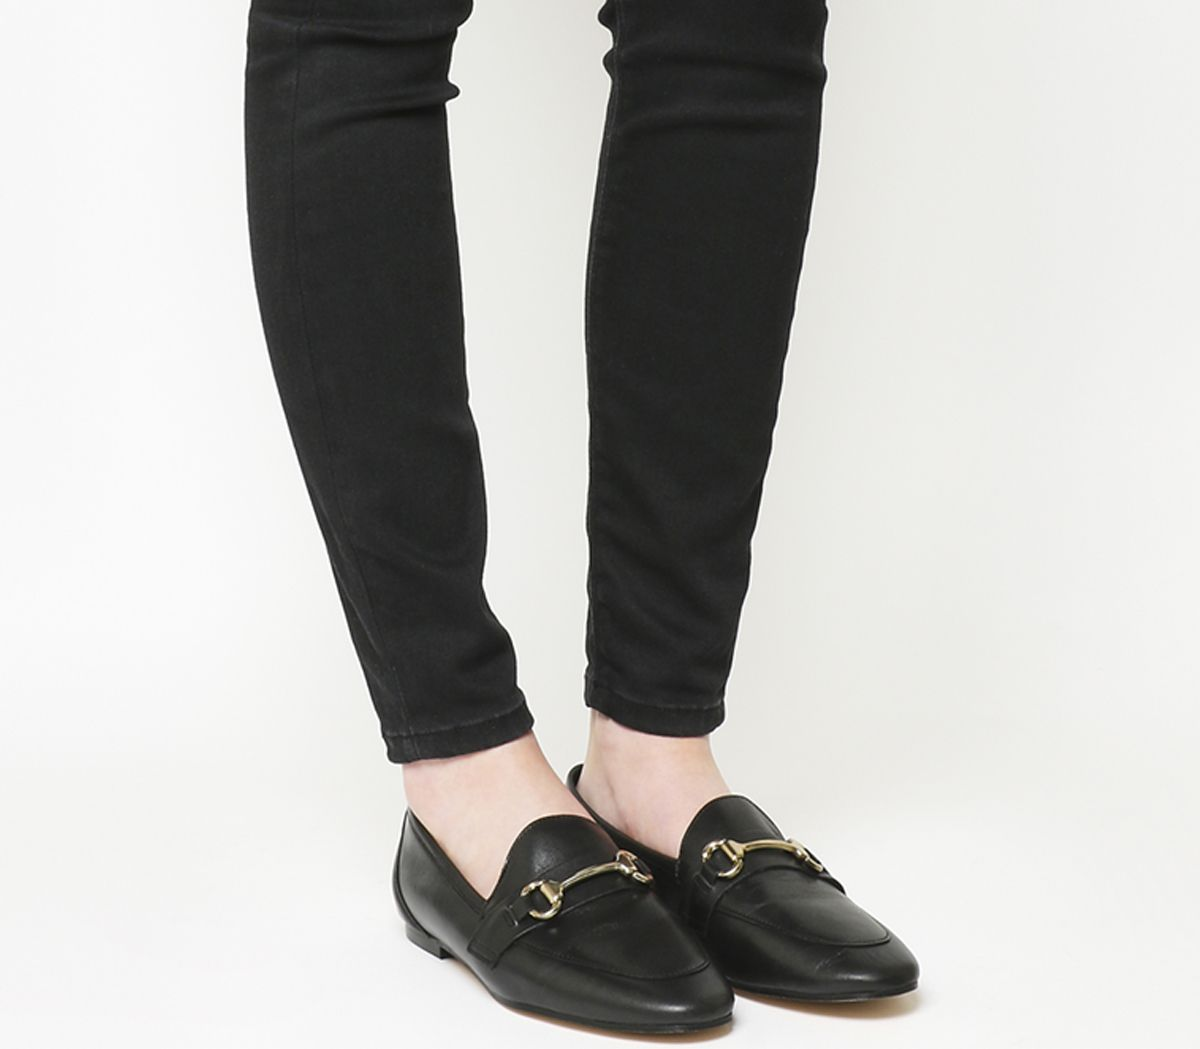 1a11986b714 Office Destiny Trim Loafers Black Leather - Flats